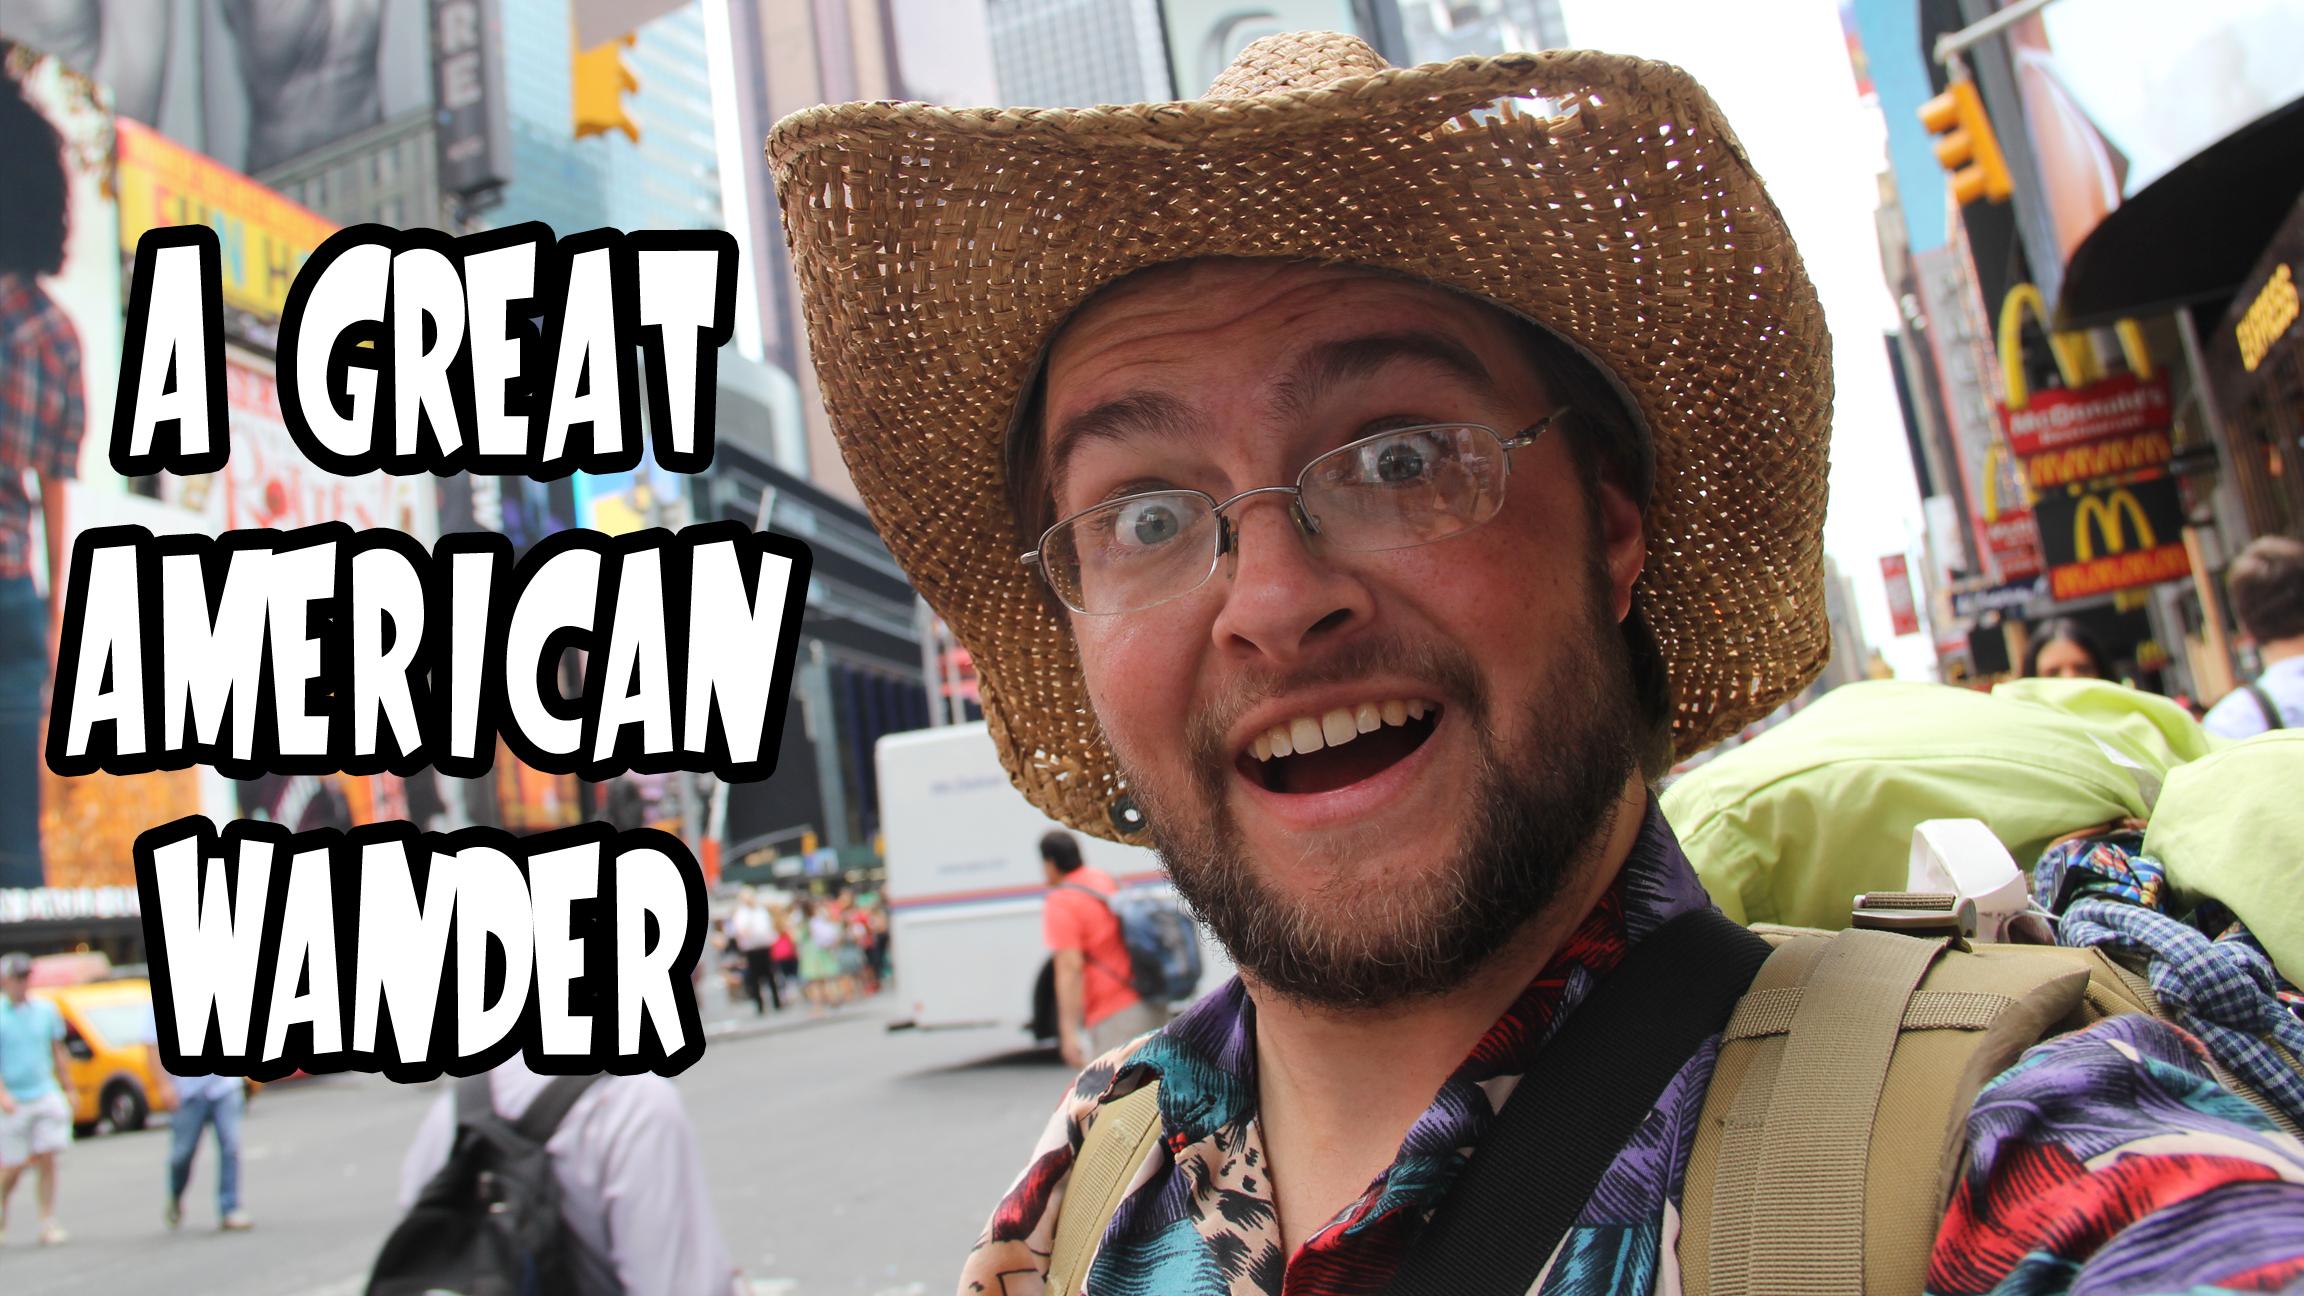 2015-08-22 A Great American Wander – My Journey So Far 3